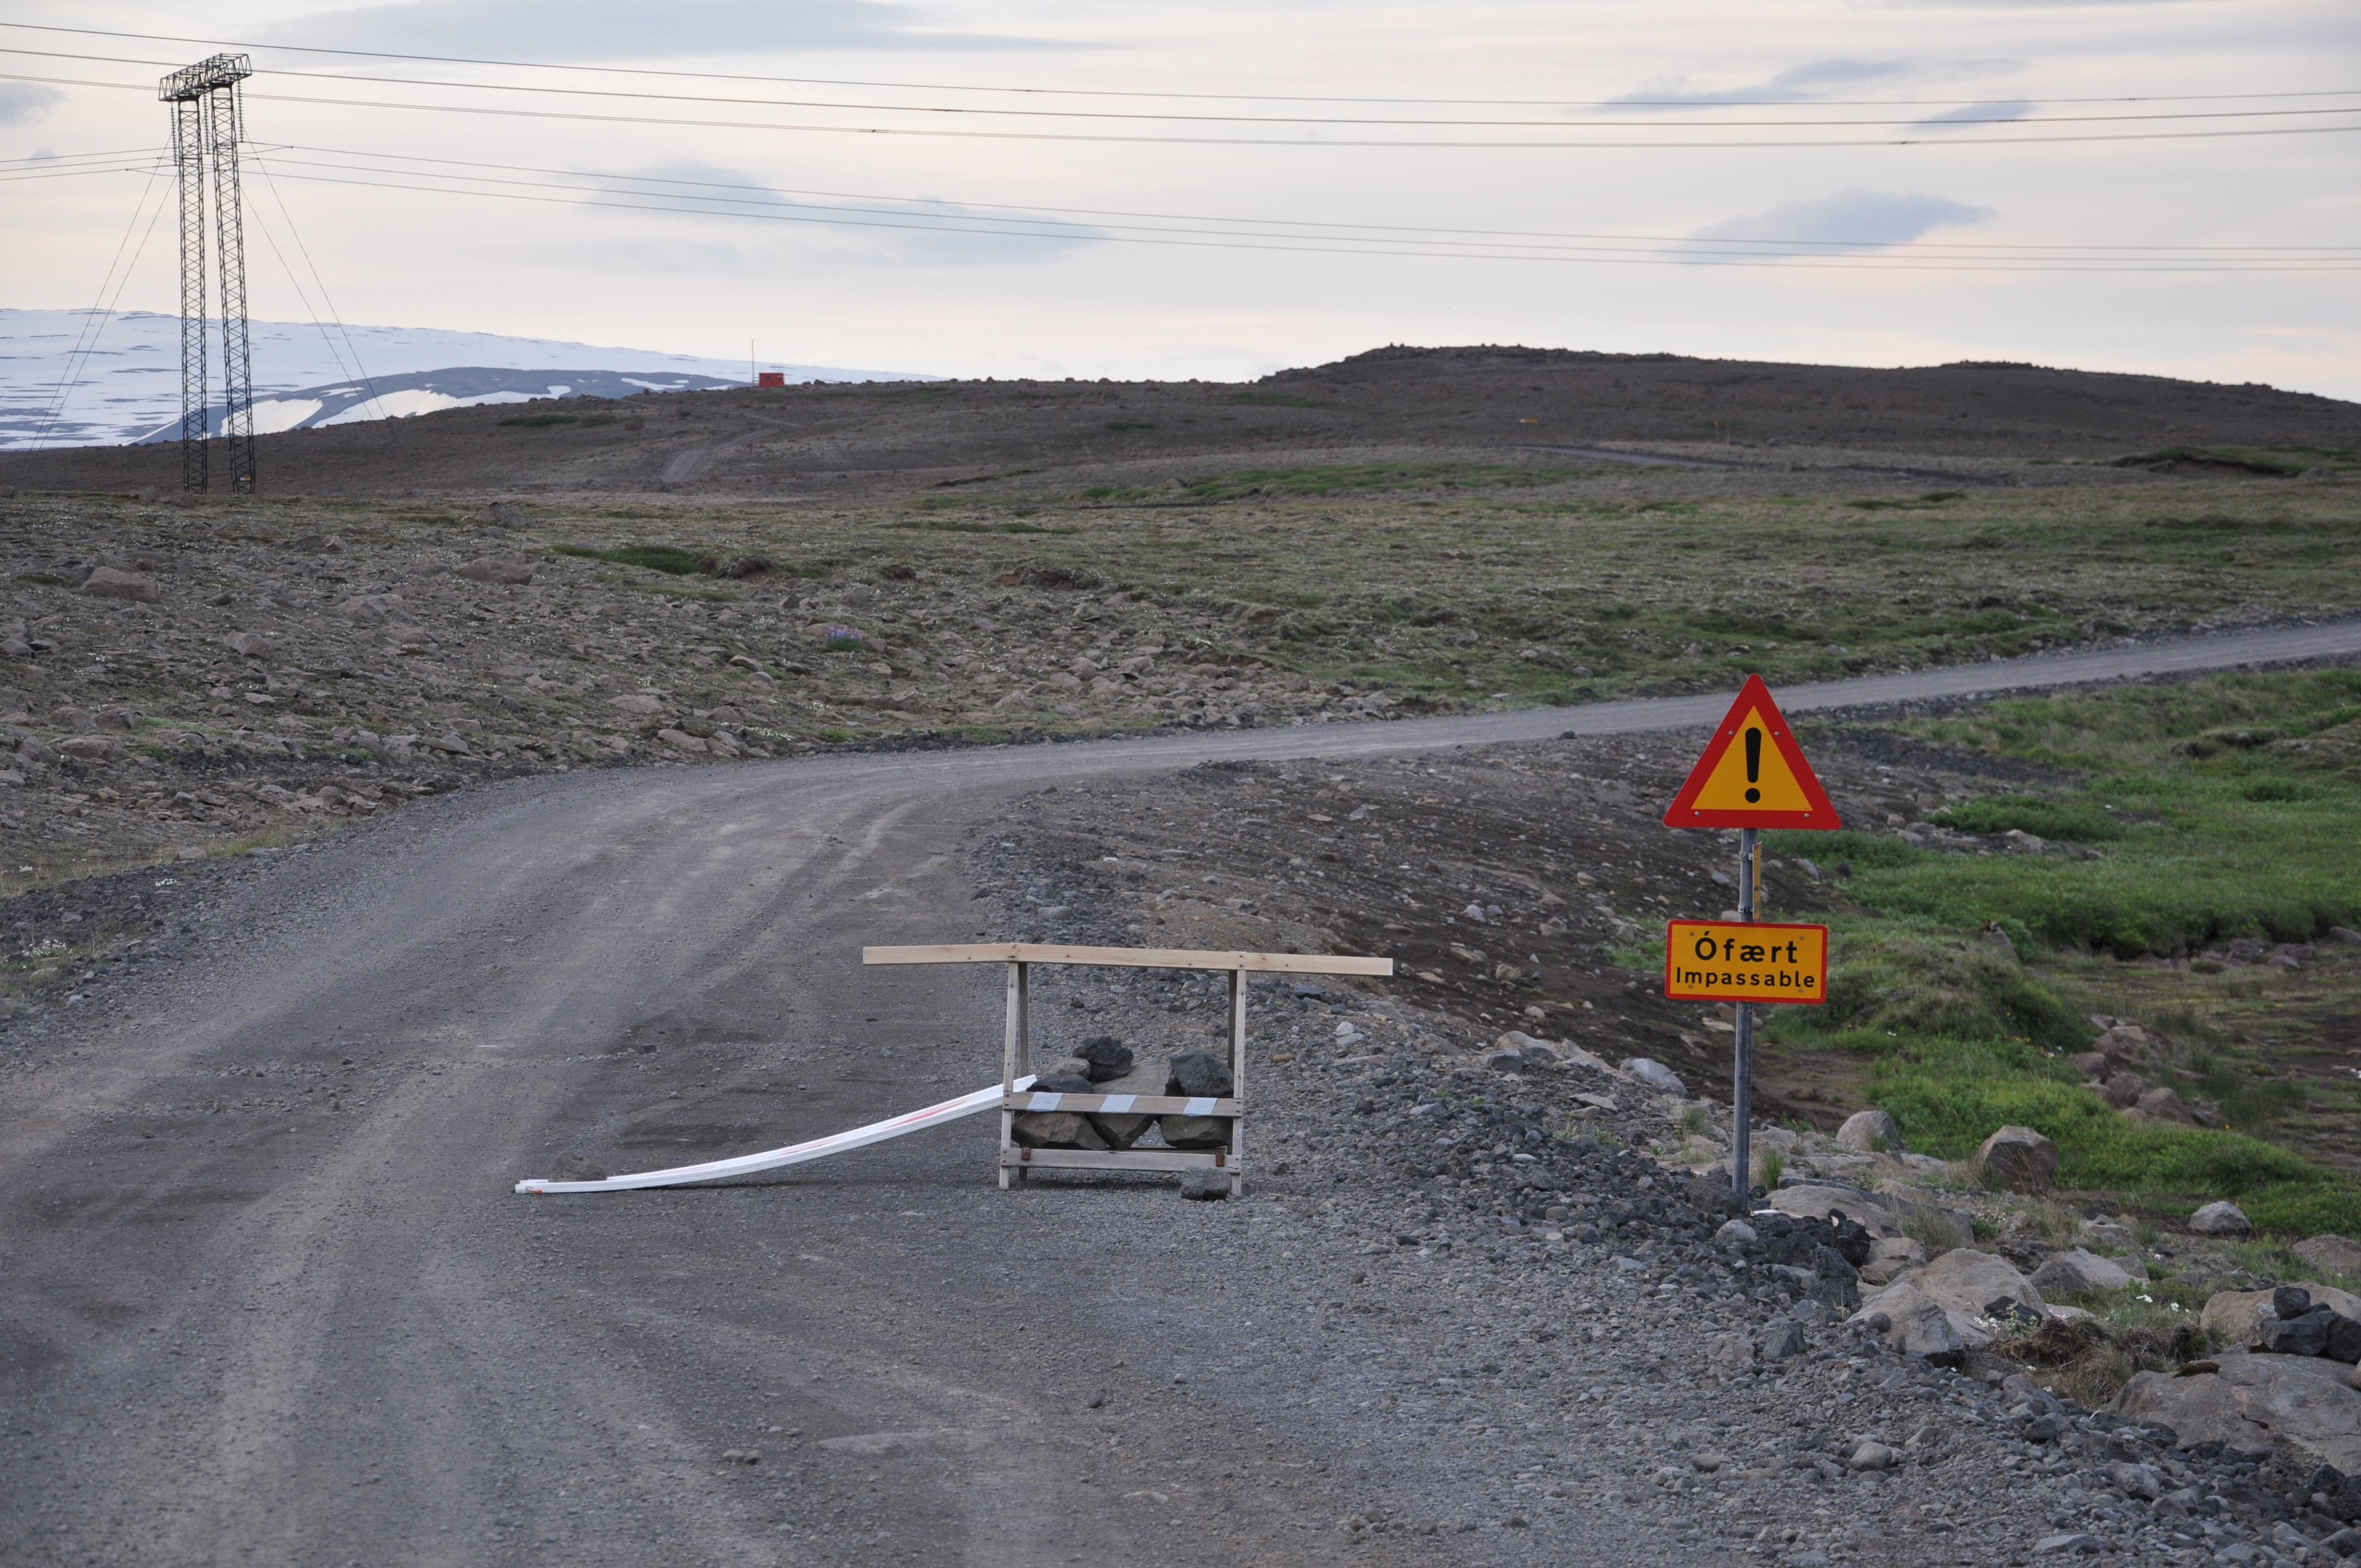 Znalezione obrazy dla zapytania private road iceland